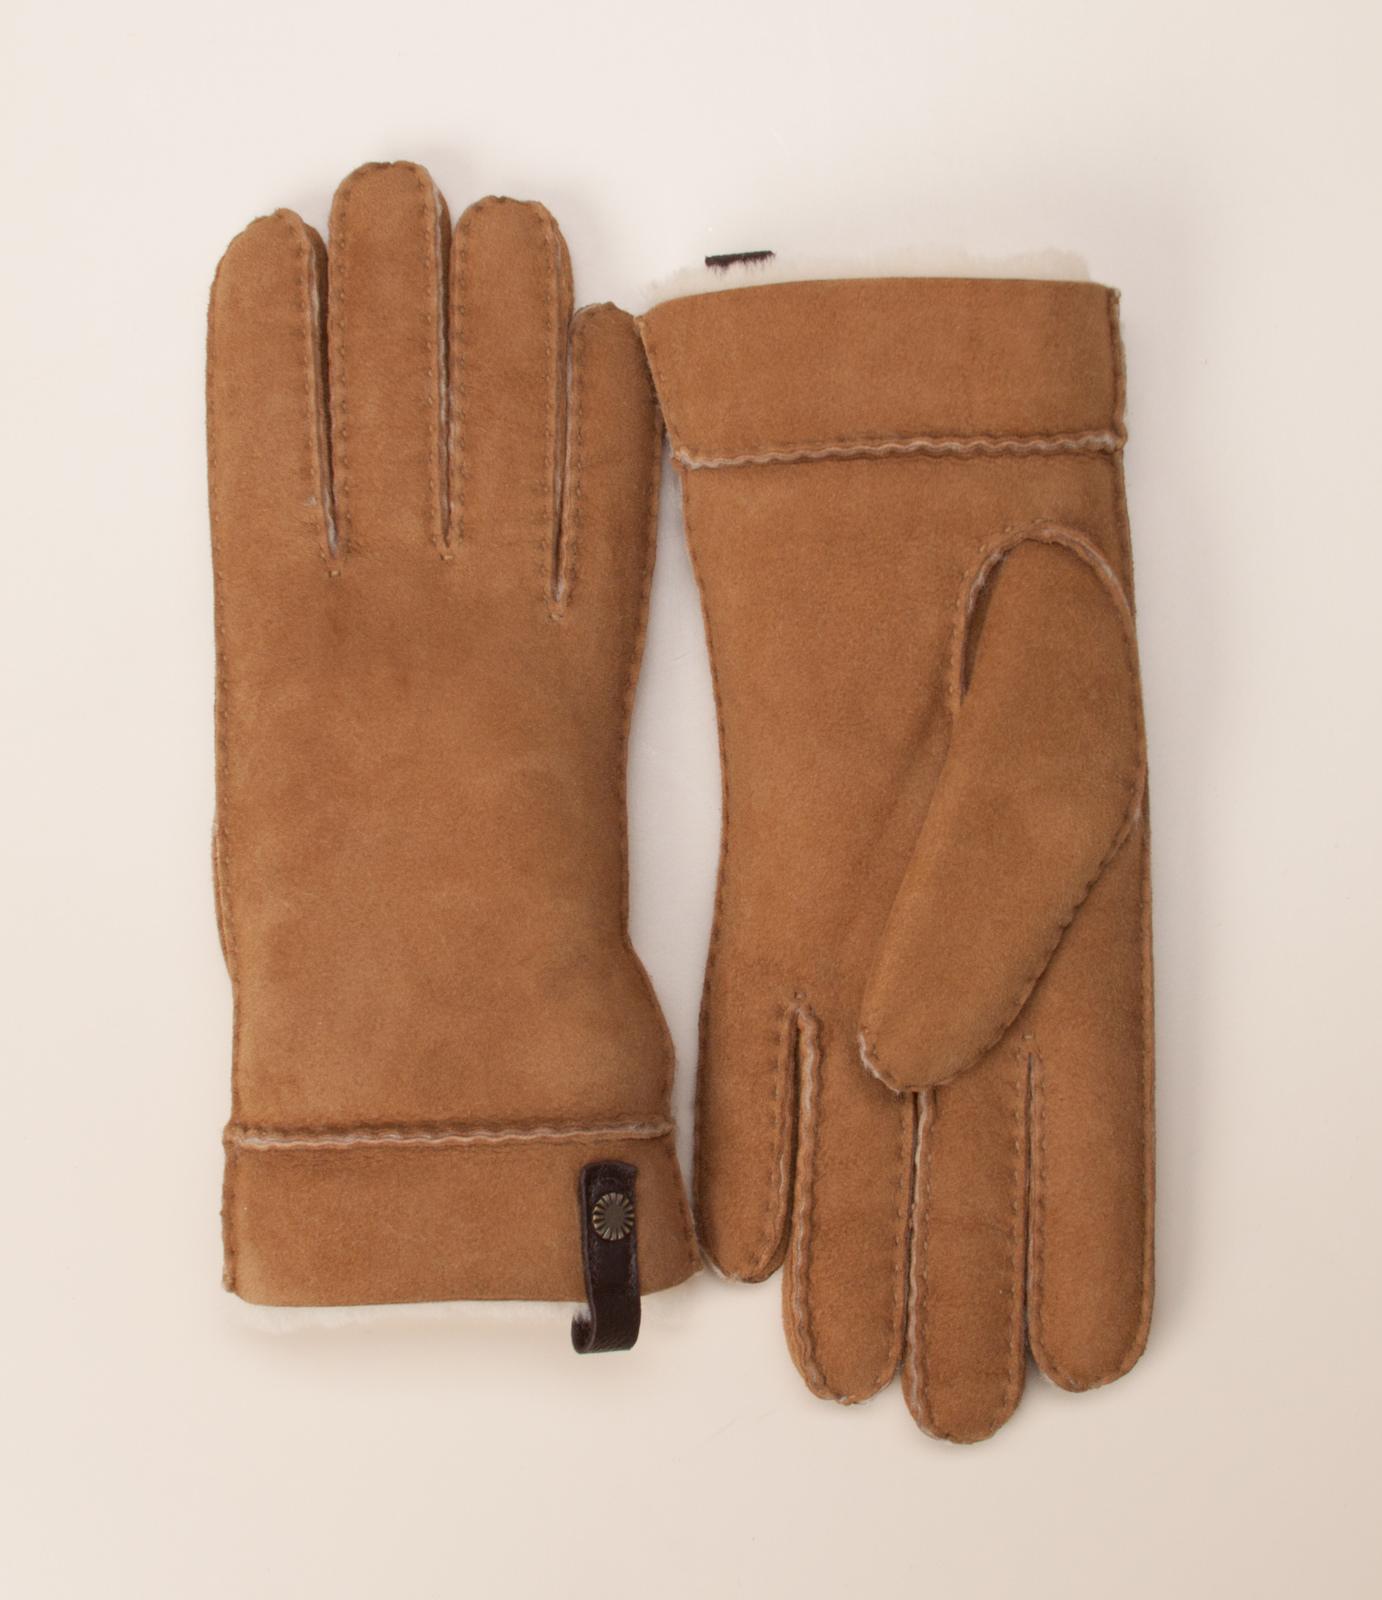 ugg damen acces damen handschuhe in cognac kaufen zumnorde online shop. Black Bedroom Furniture Sets. Home Design Ideas